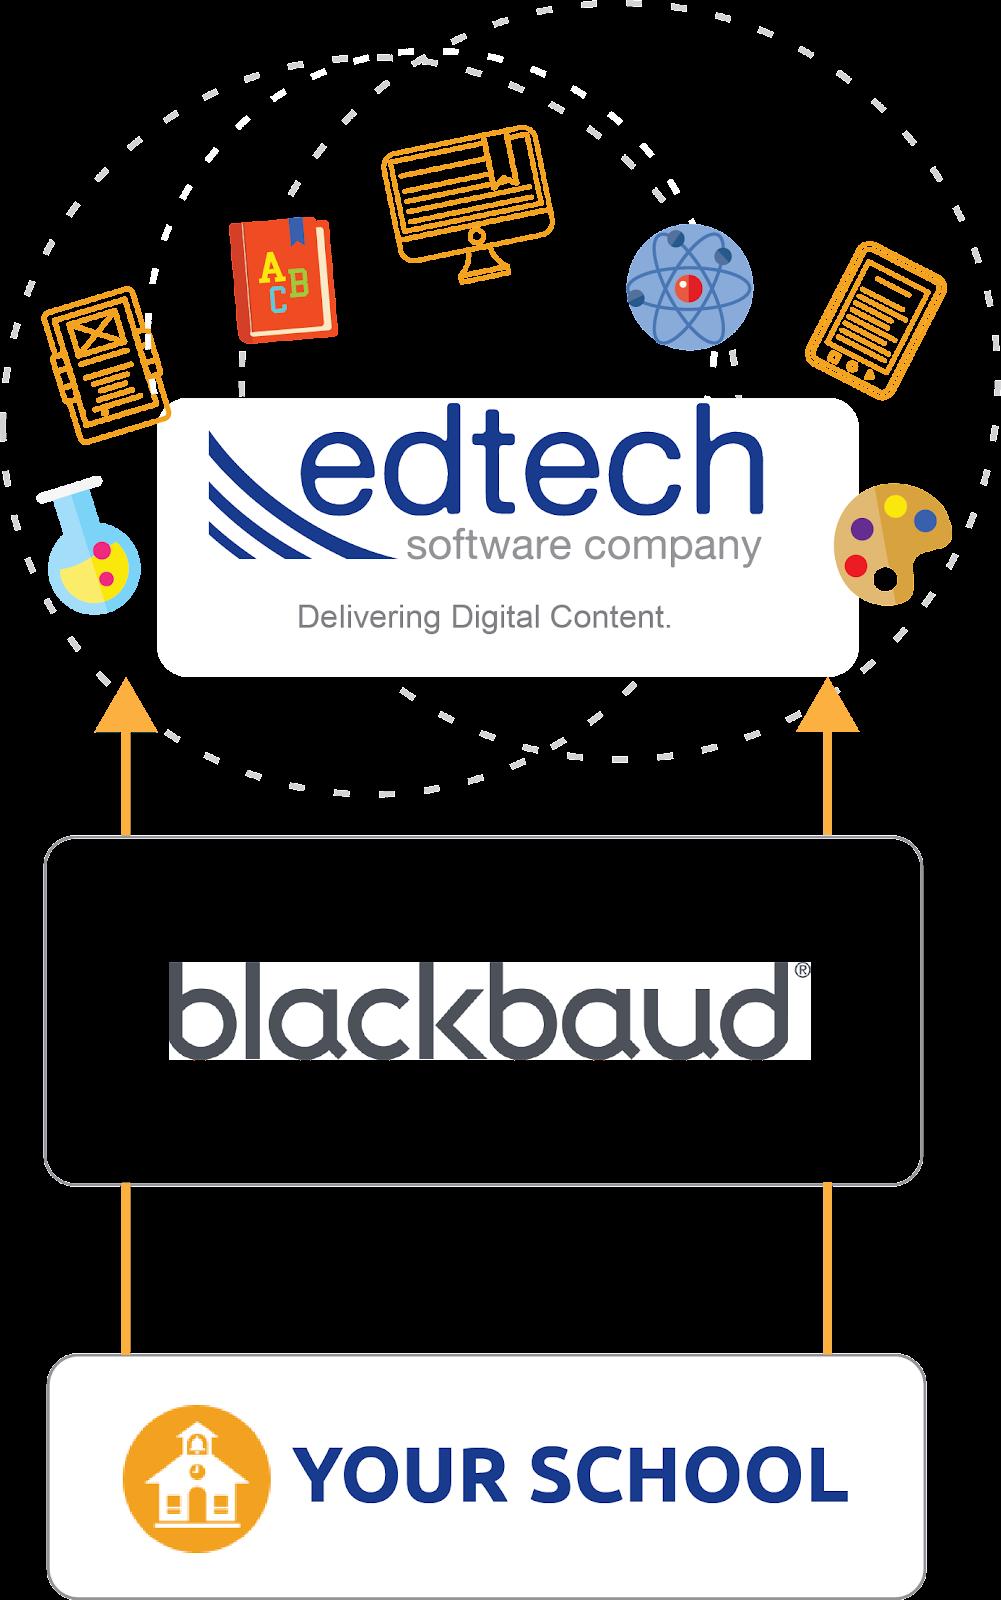 EdTech_Blackbaud.png